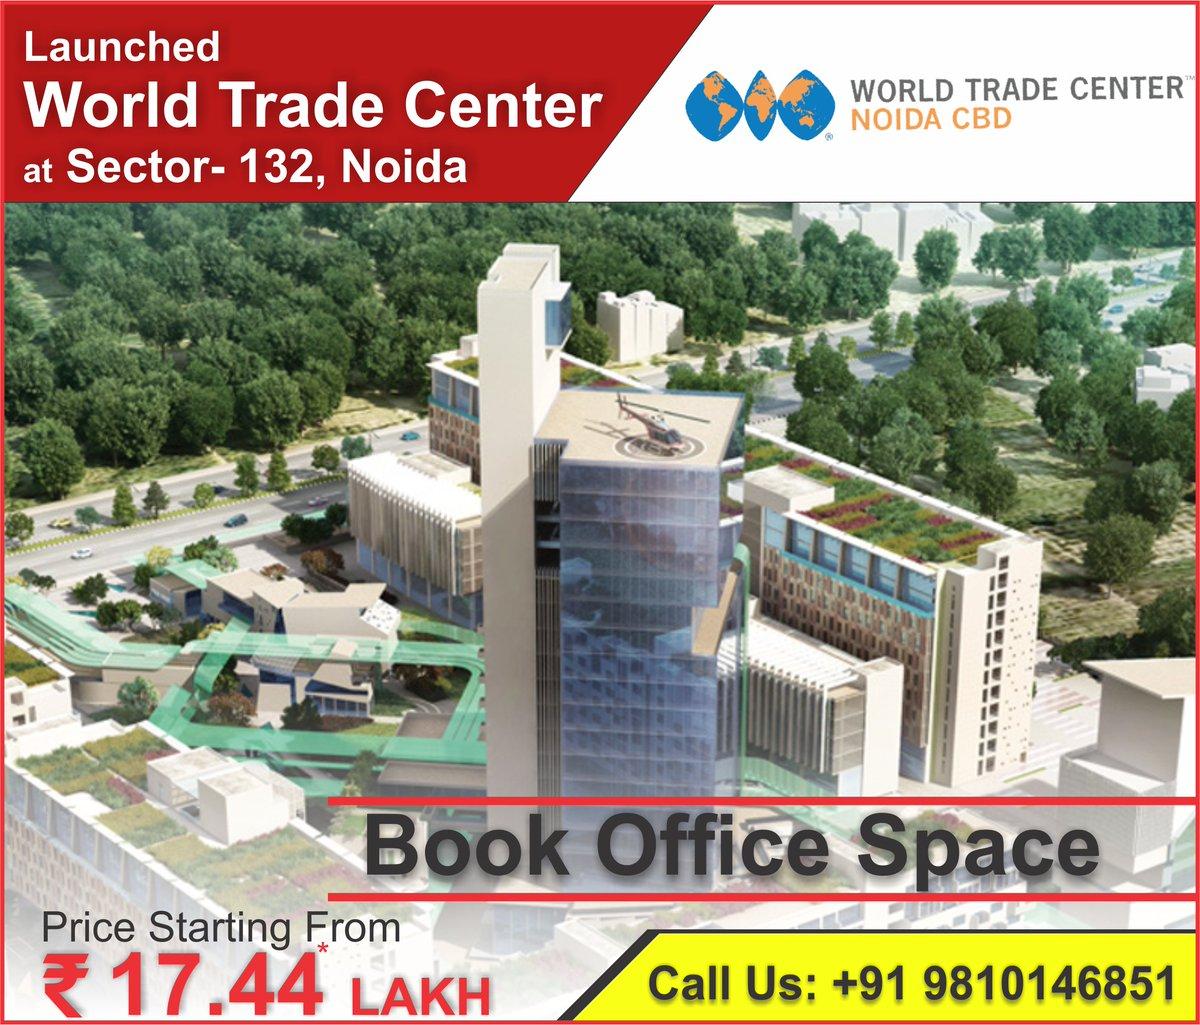 World Trade Center Sector 132 Noida (@wtc_sector132) | Twitter